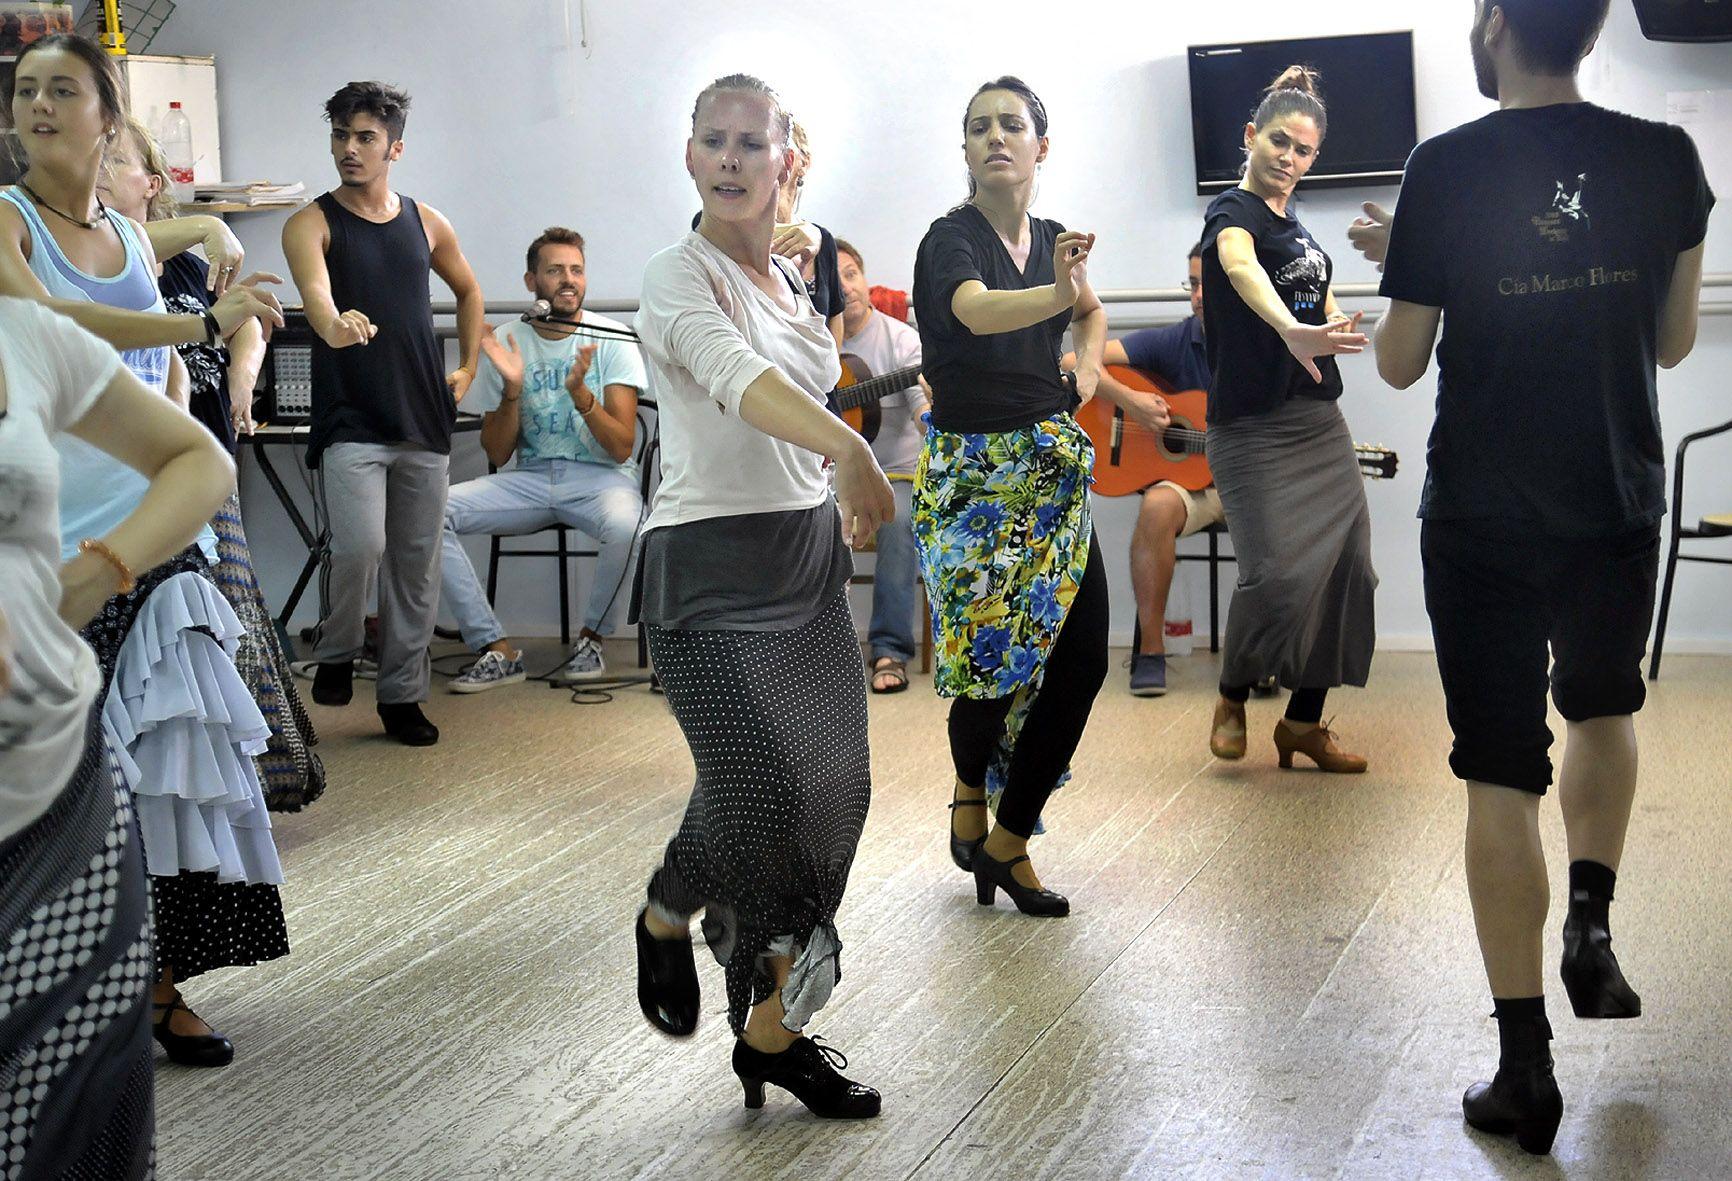 Cursos_de__verano___Escuela_de_Baile_Jerez___04